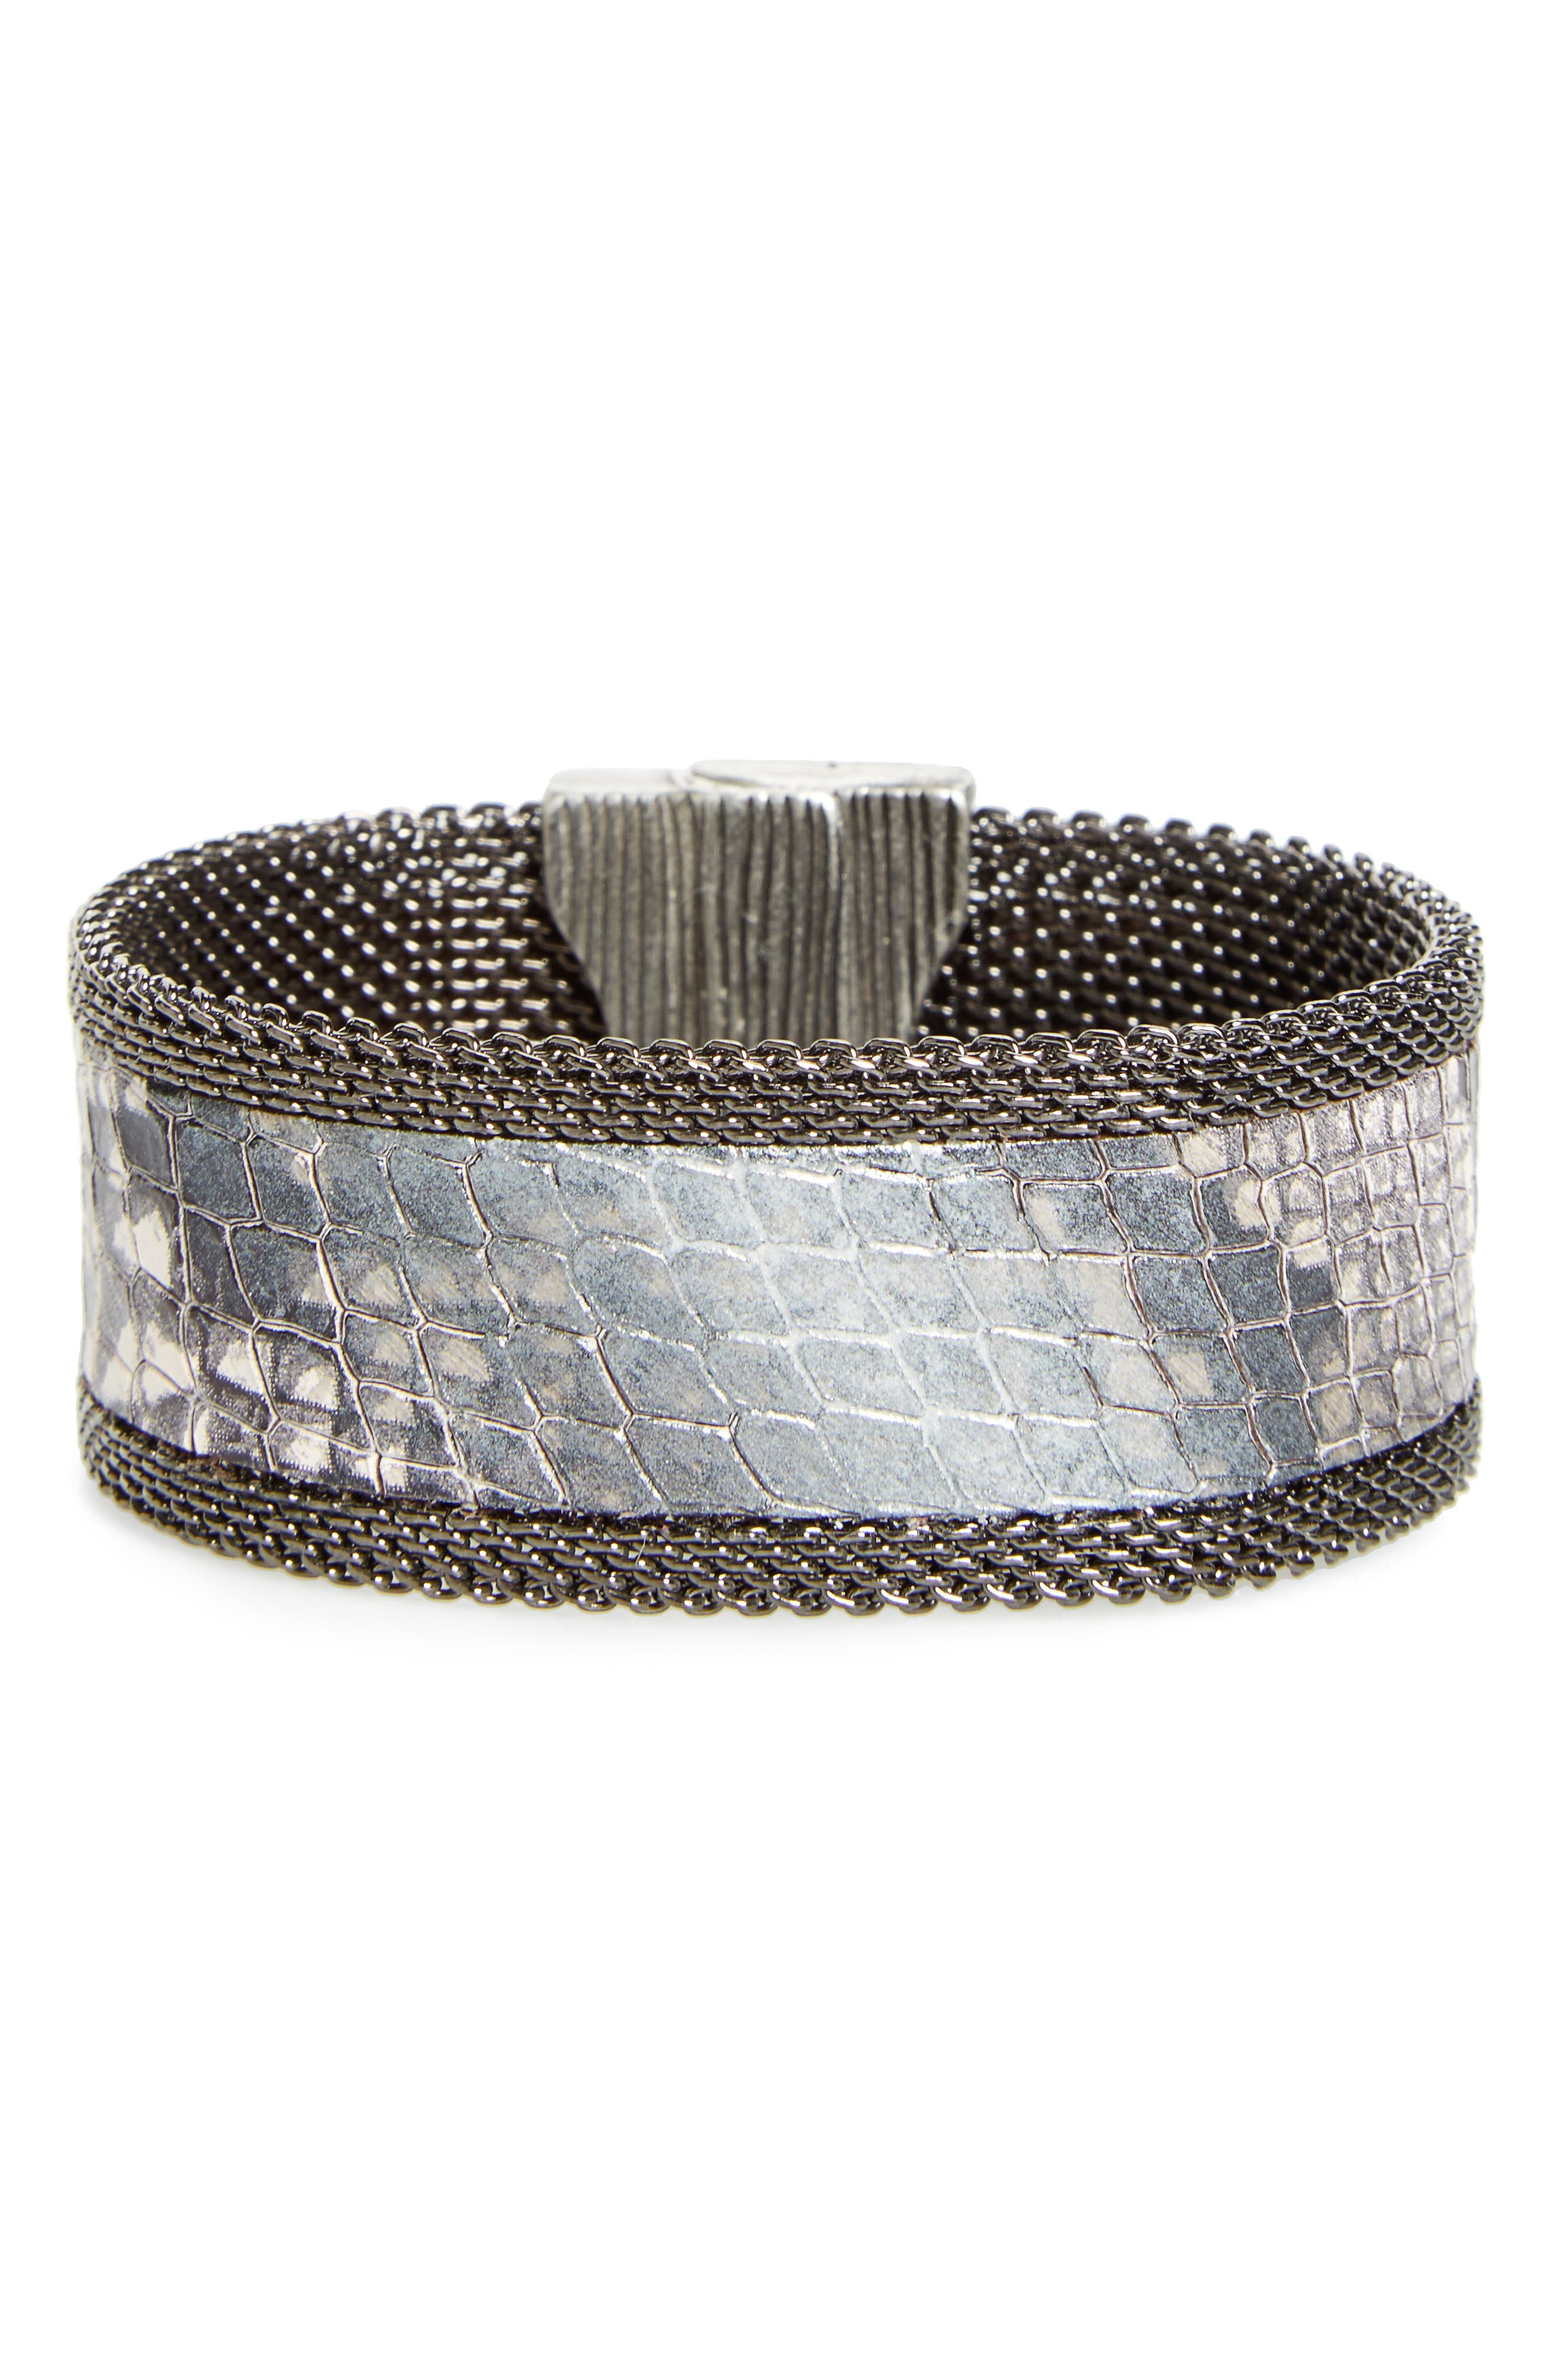 Alternate Image 1 Selected - Cynthia Desser Genuine Snakeskin Cuff